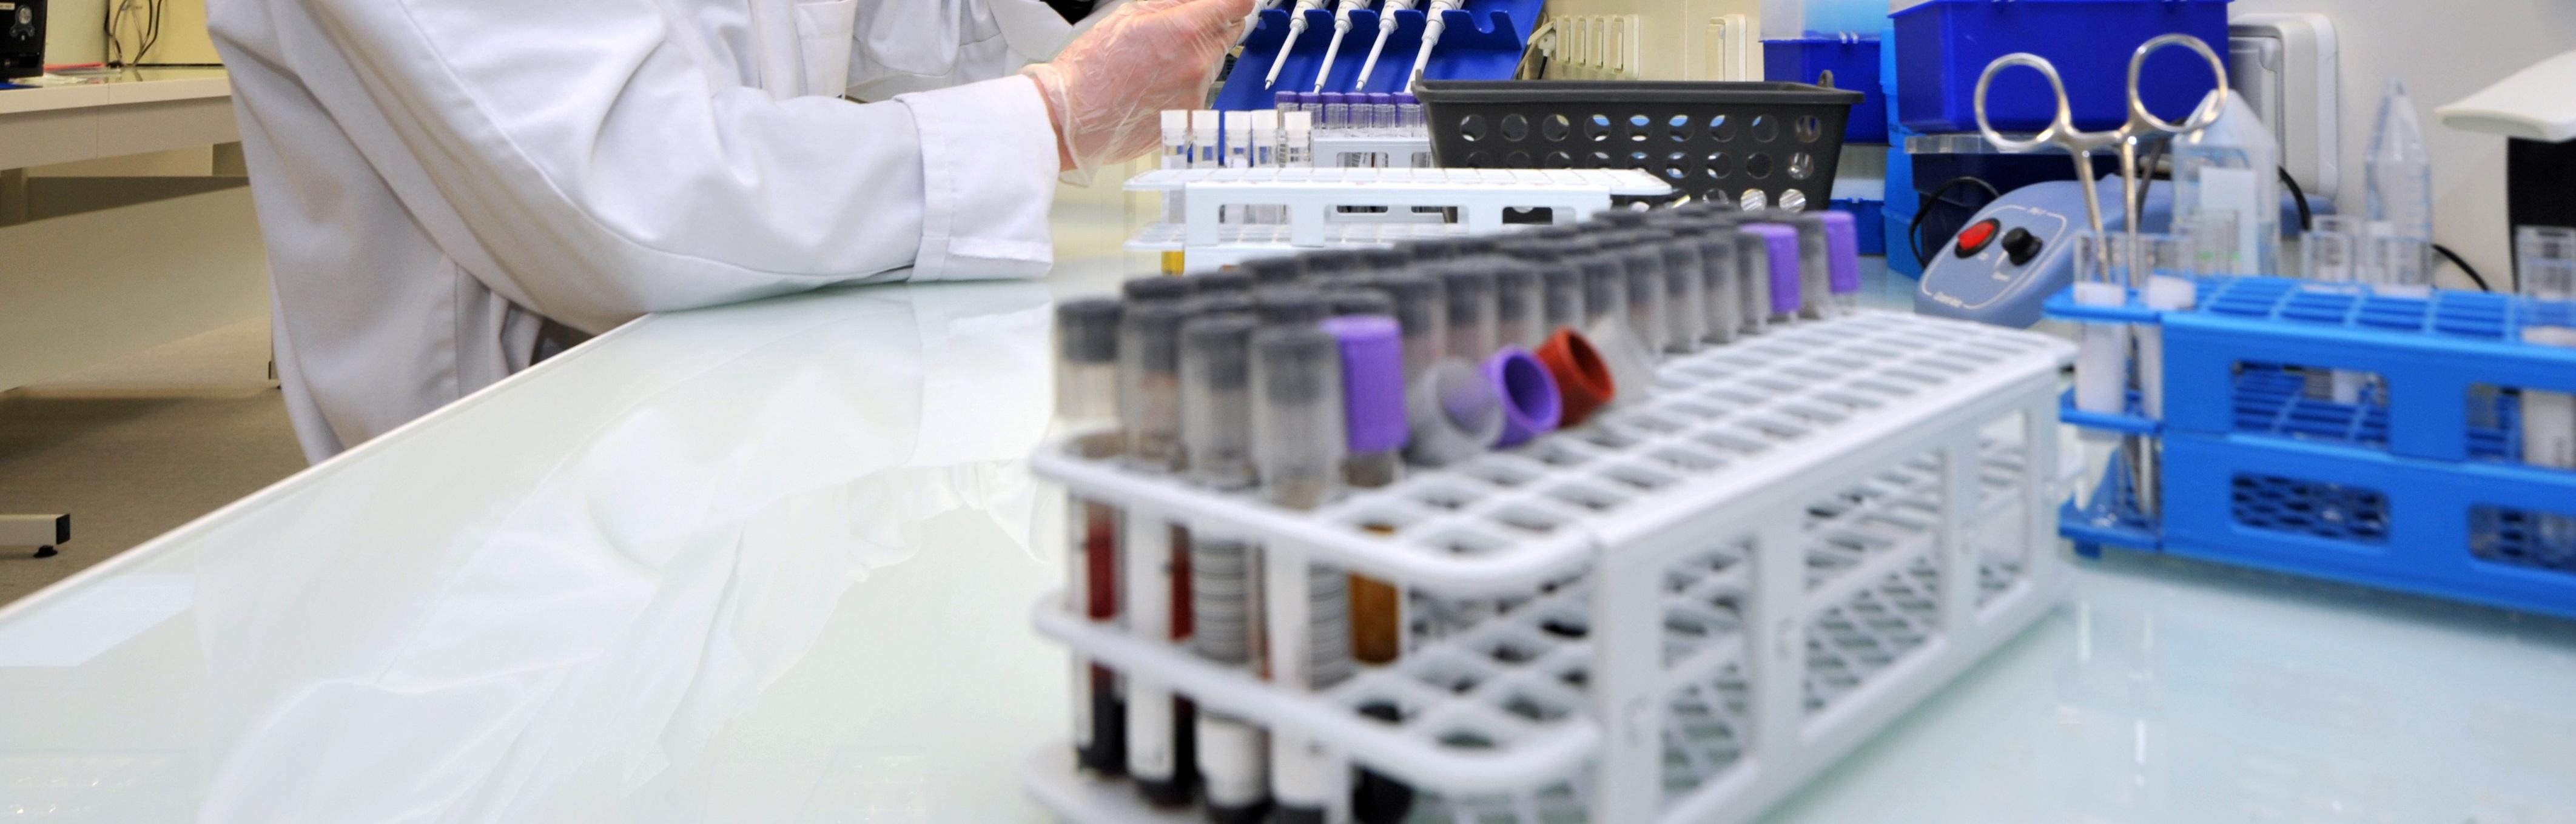 Blue apron drug test - Blue Apron Drug Test 7